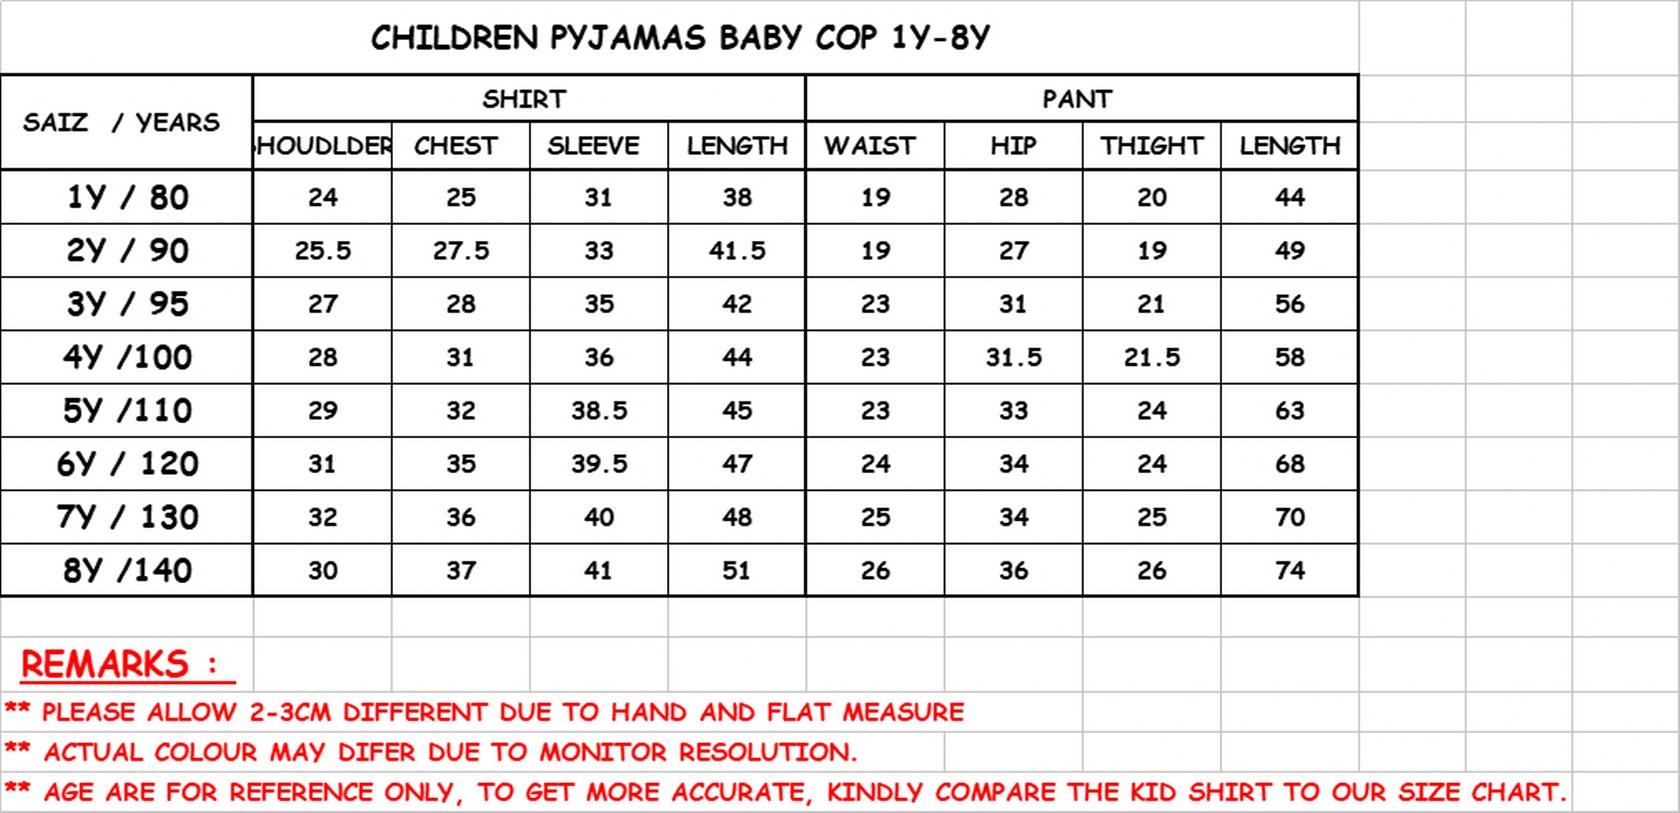 CY 153729 CHILDREN  SUIT PASANG BUDAK DISNEY PYJAMAS HELLO KITTY